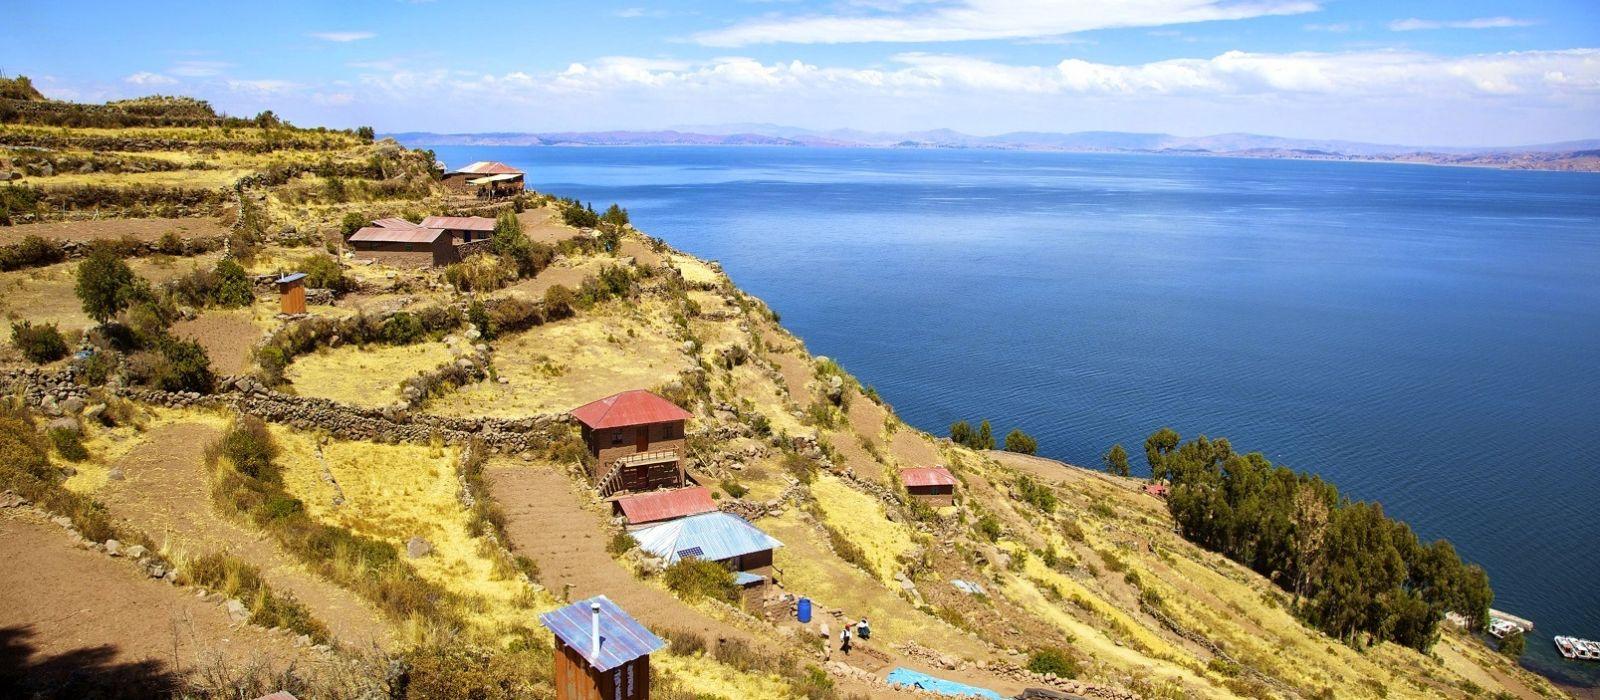 Destination Taquile / Amantaní Peru